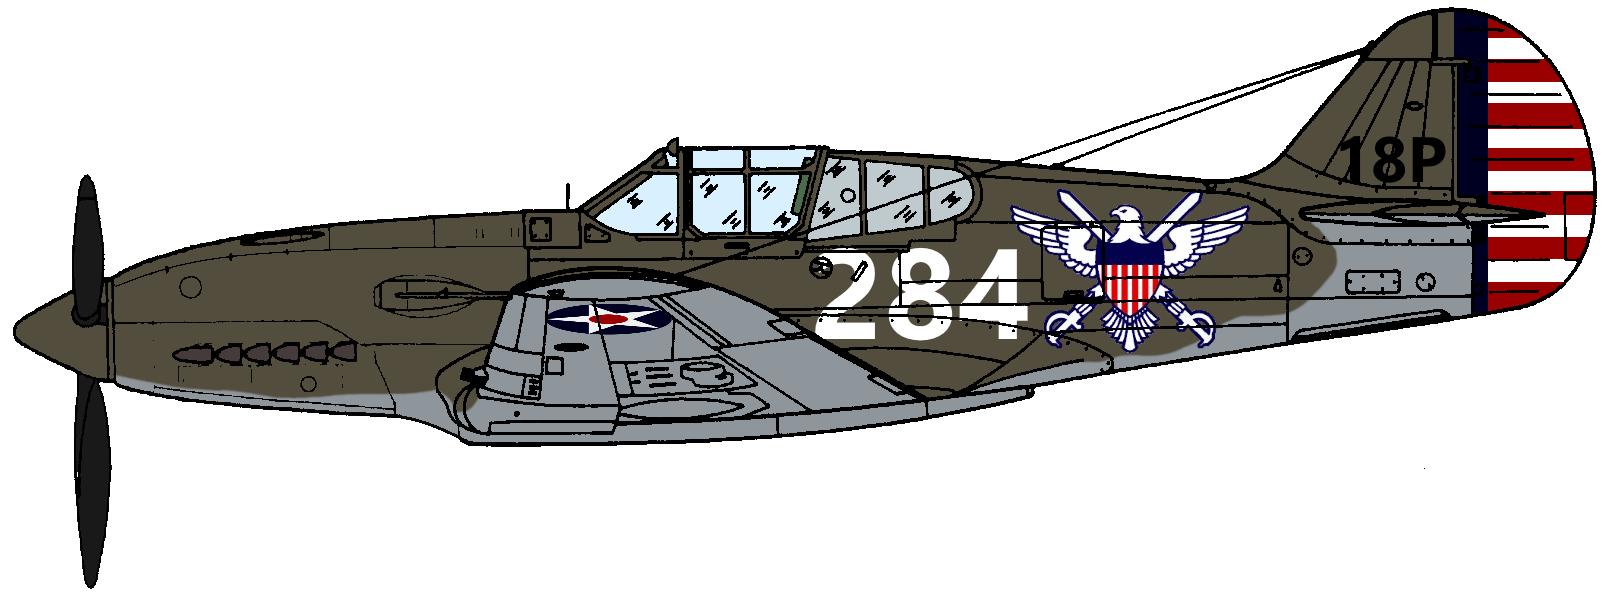 P-27B.png